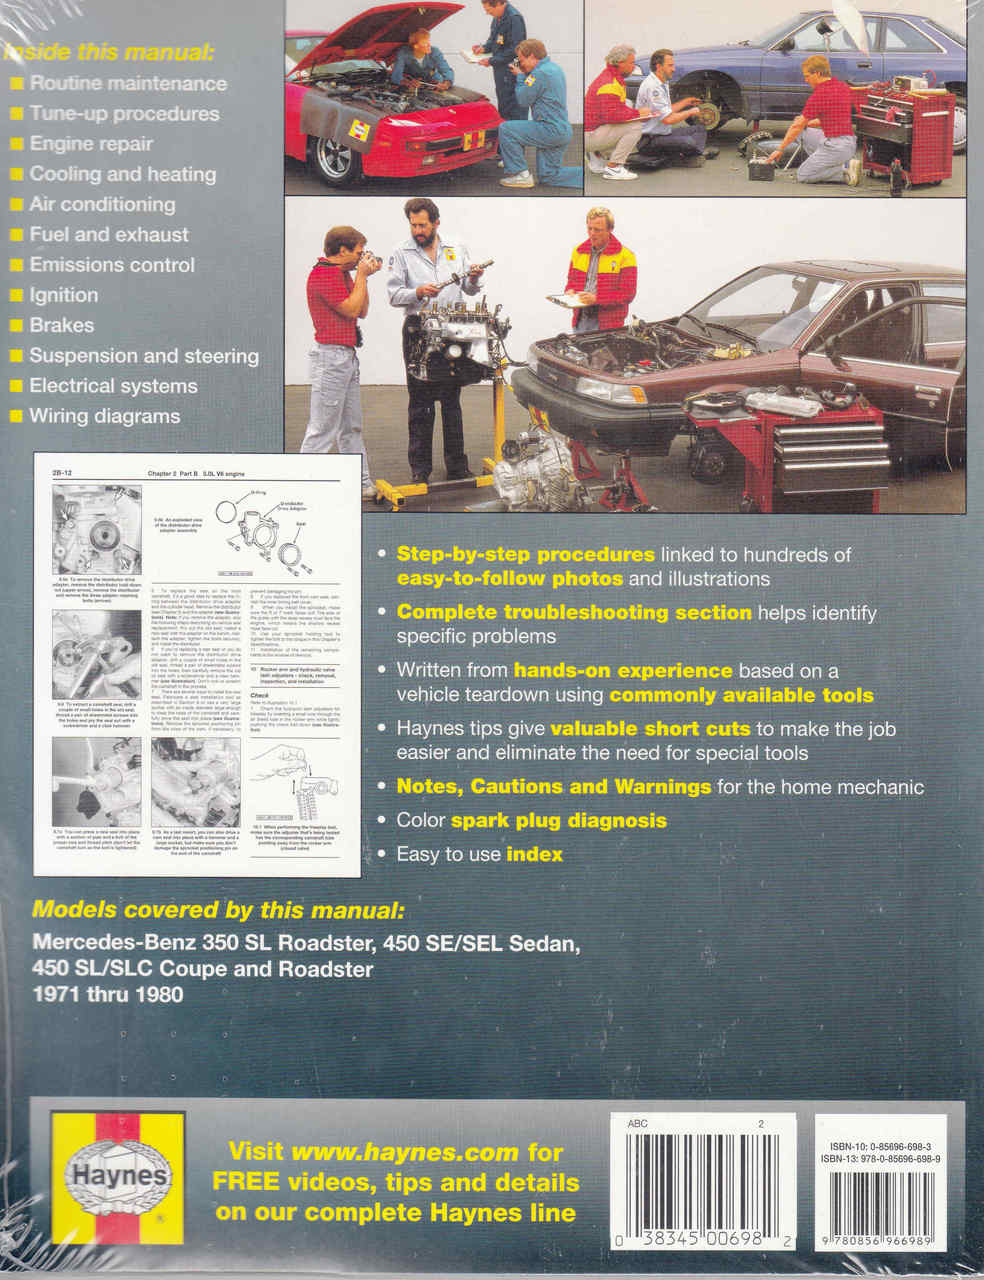 Mercedes - Benz 350 & 450 1971 - 1980 Workshop Manual